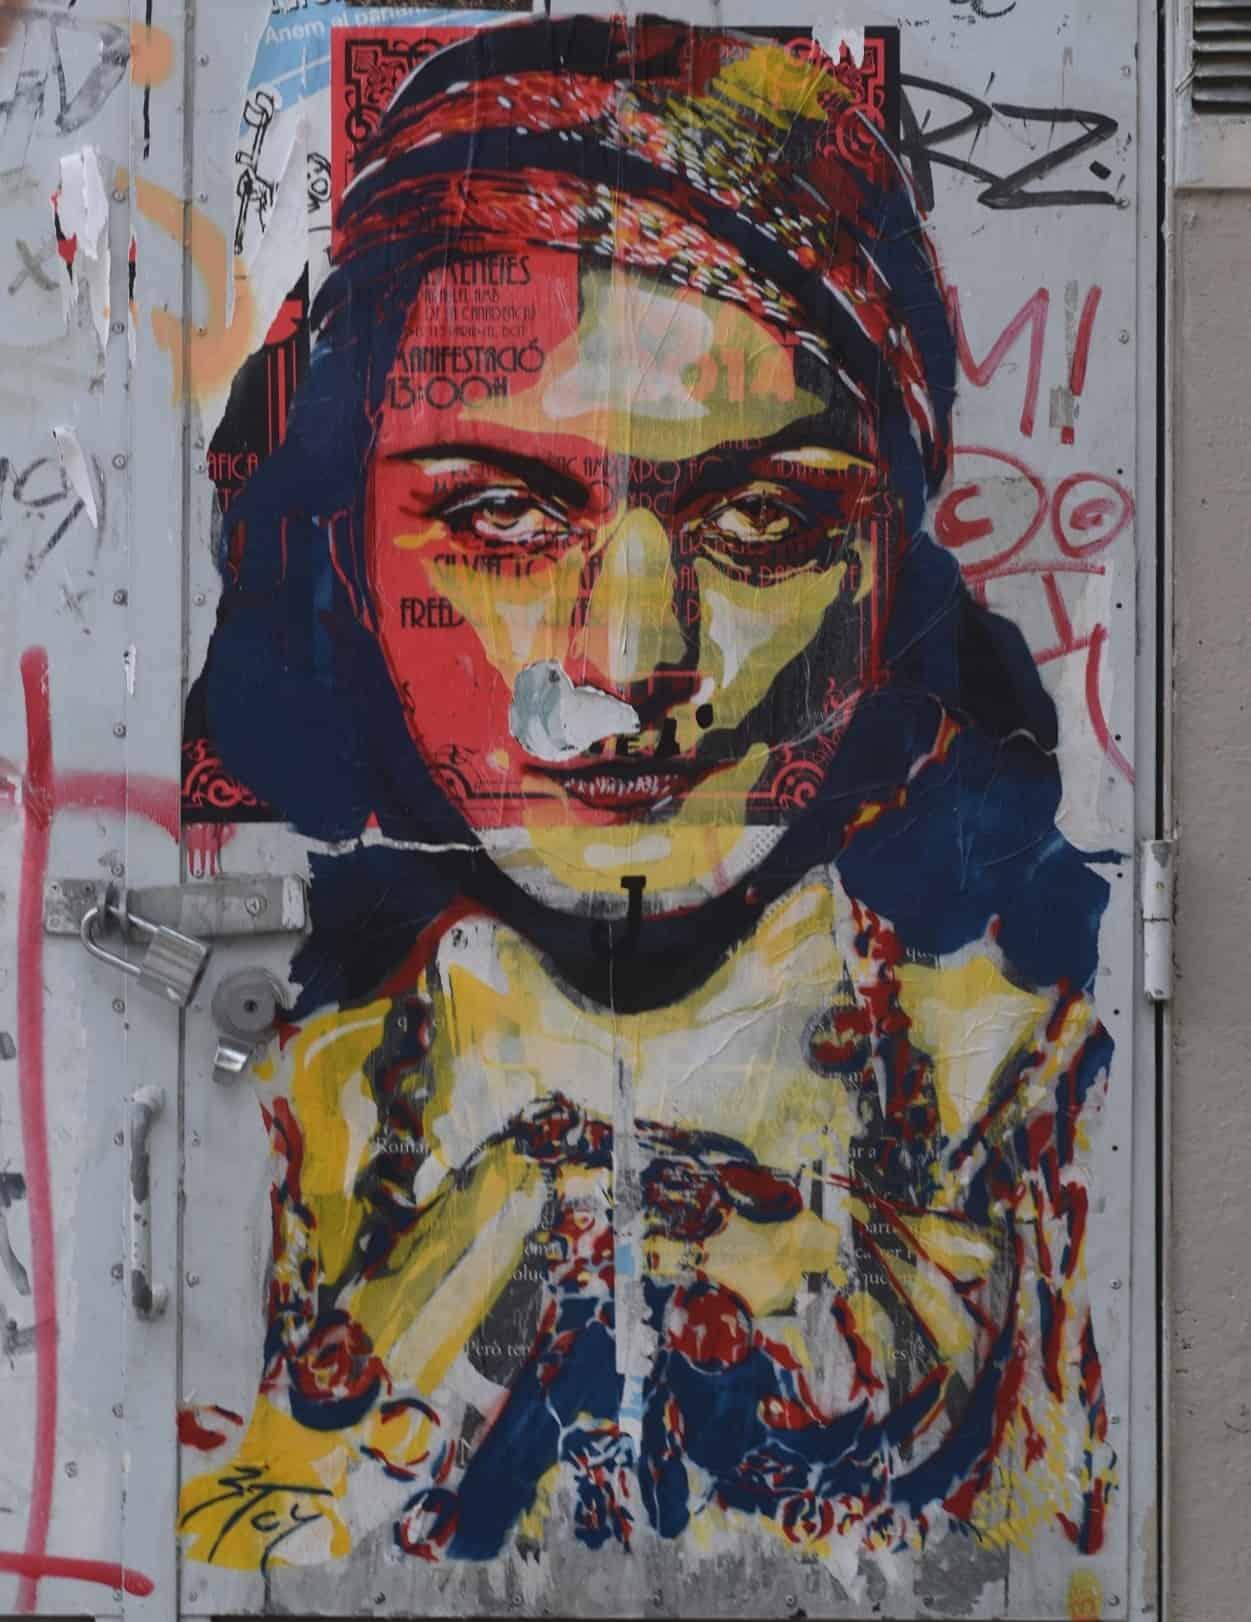 Poble Sec Street Art